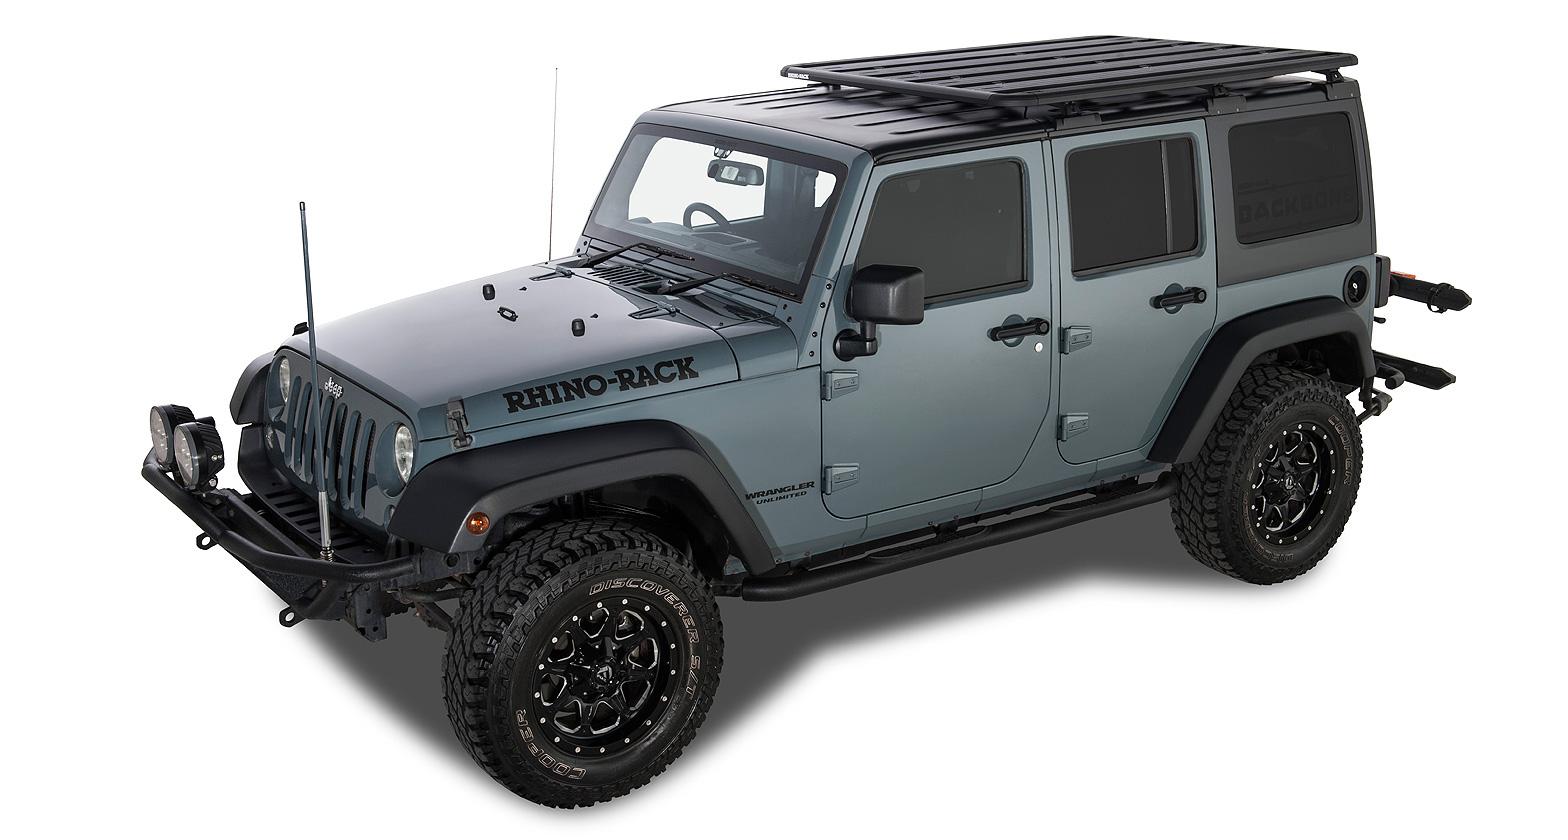 jeep wrangler jk 02 11 on rhino rack pioneer platform backbone system ja8328. Black Bedroom Furniture Sets. Home Design Ideas